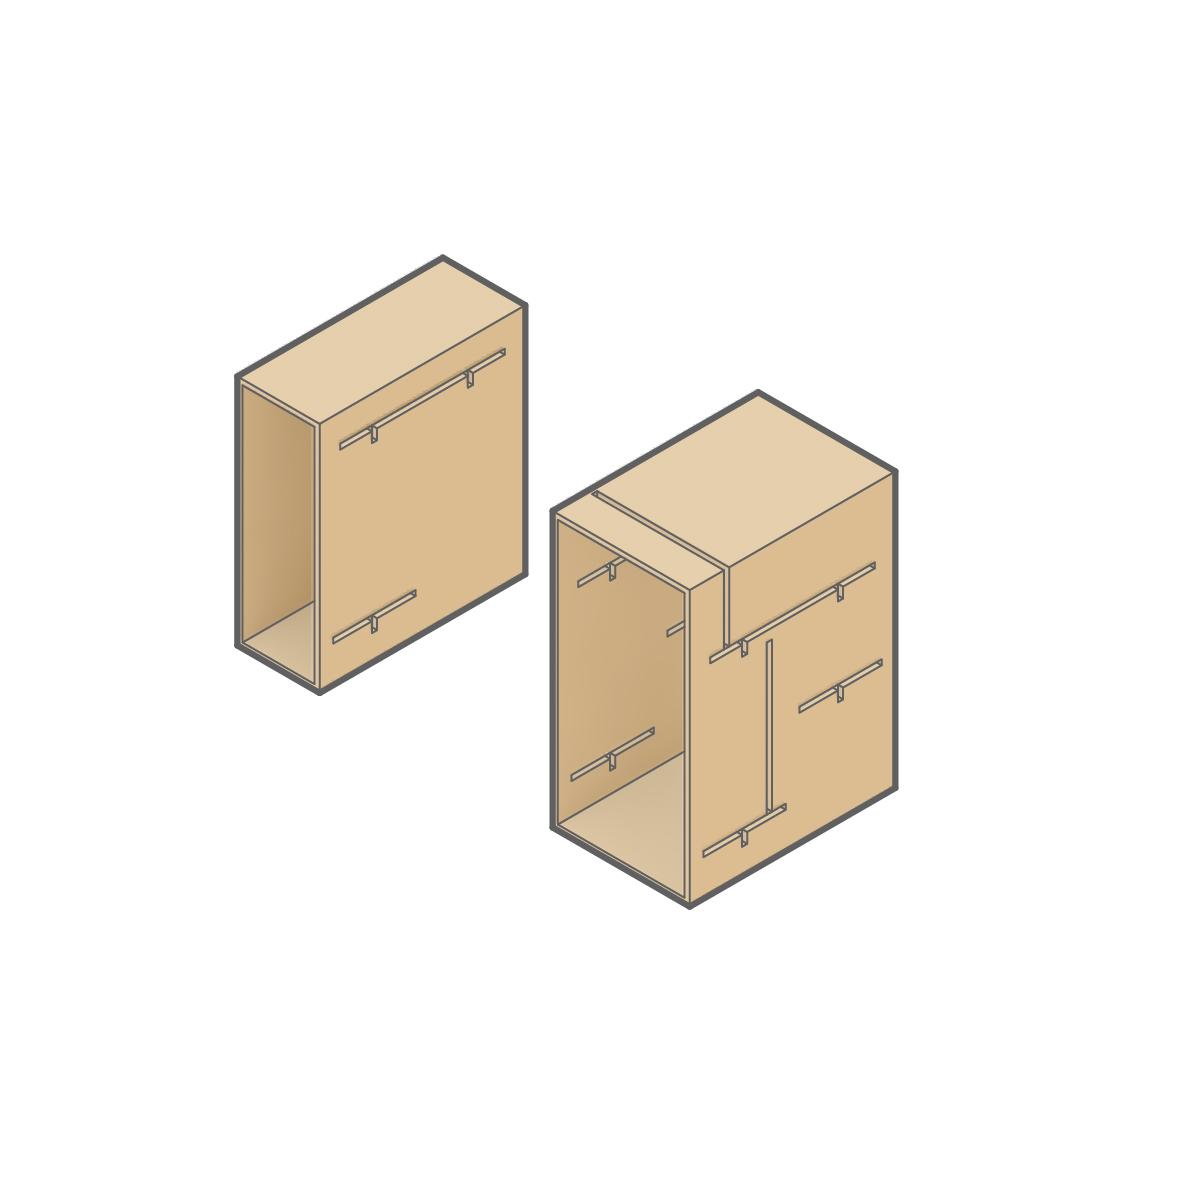 furniture-02.jpg